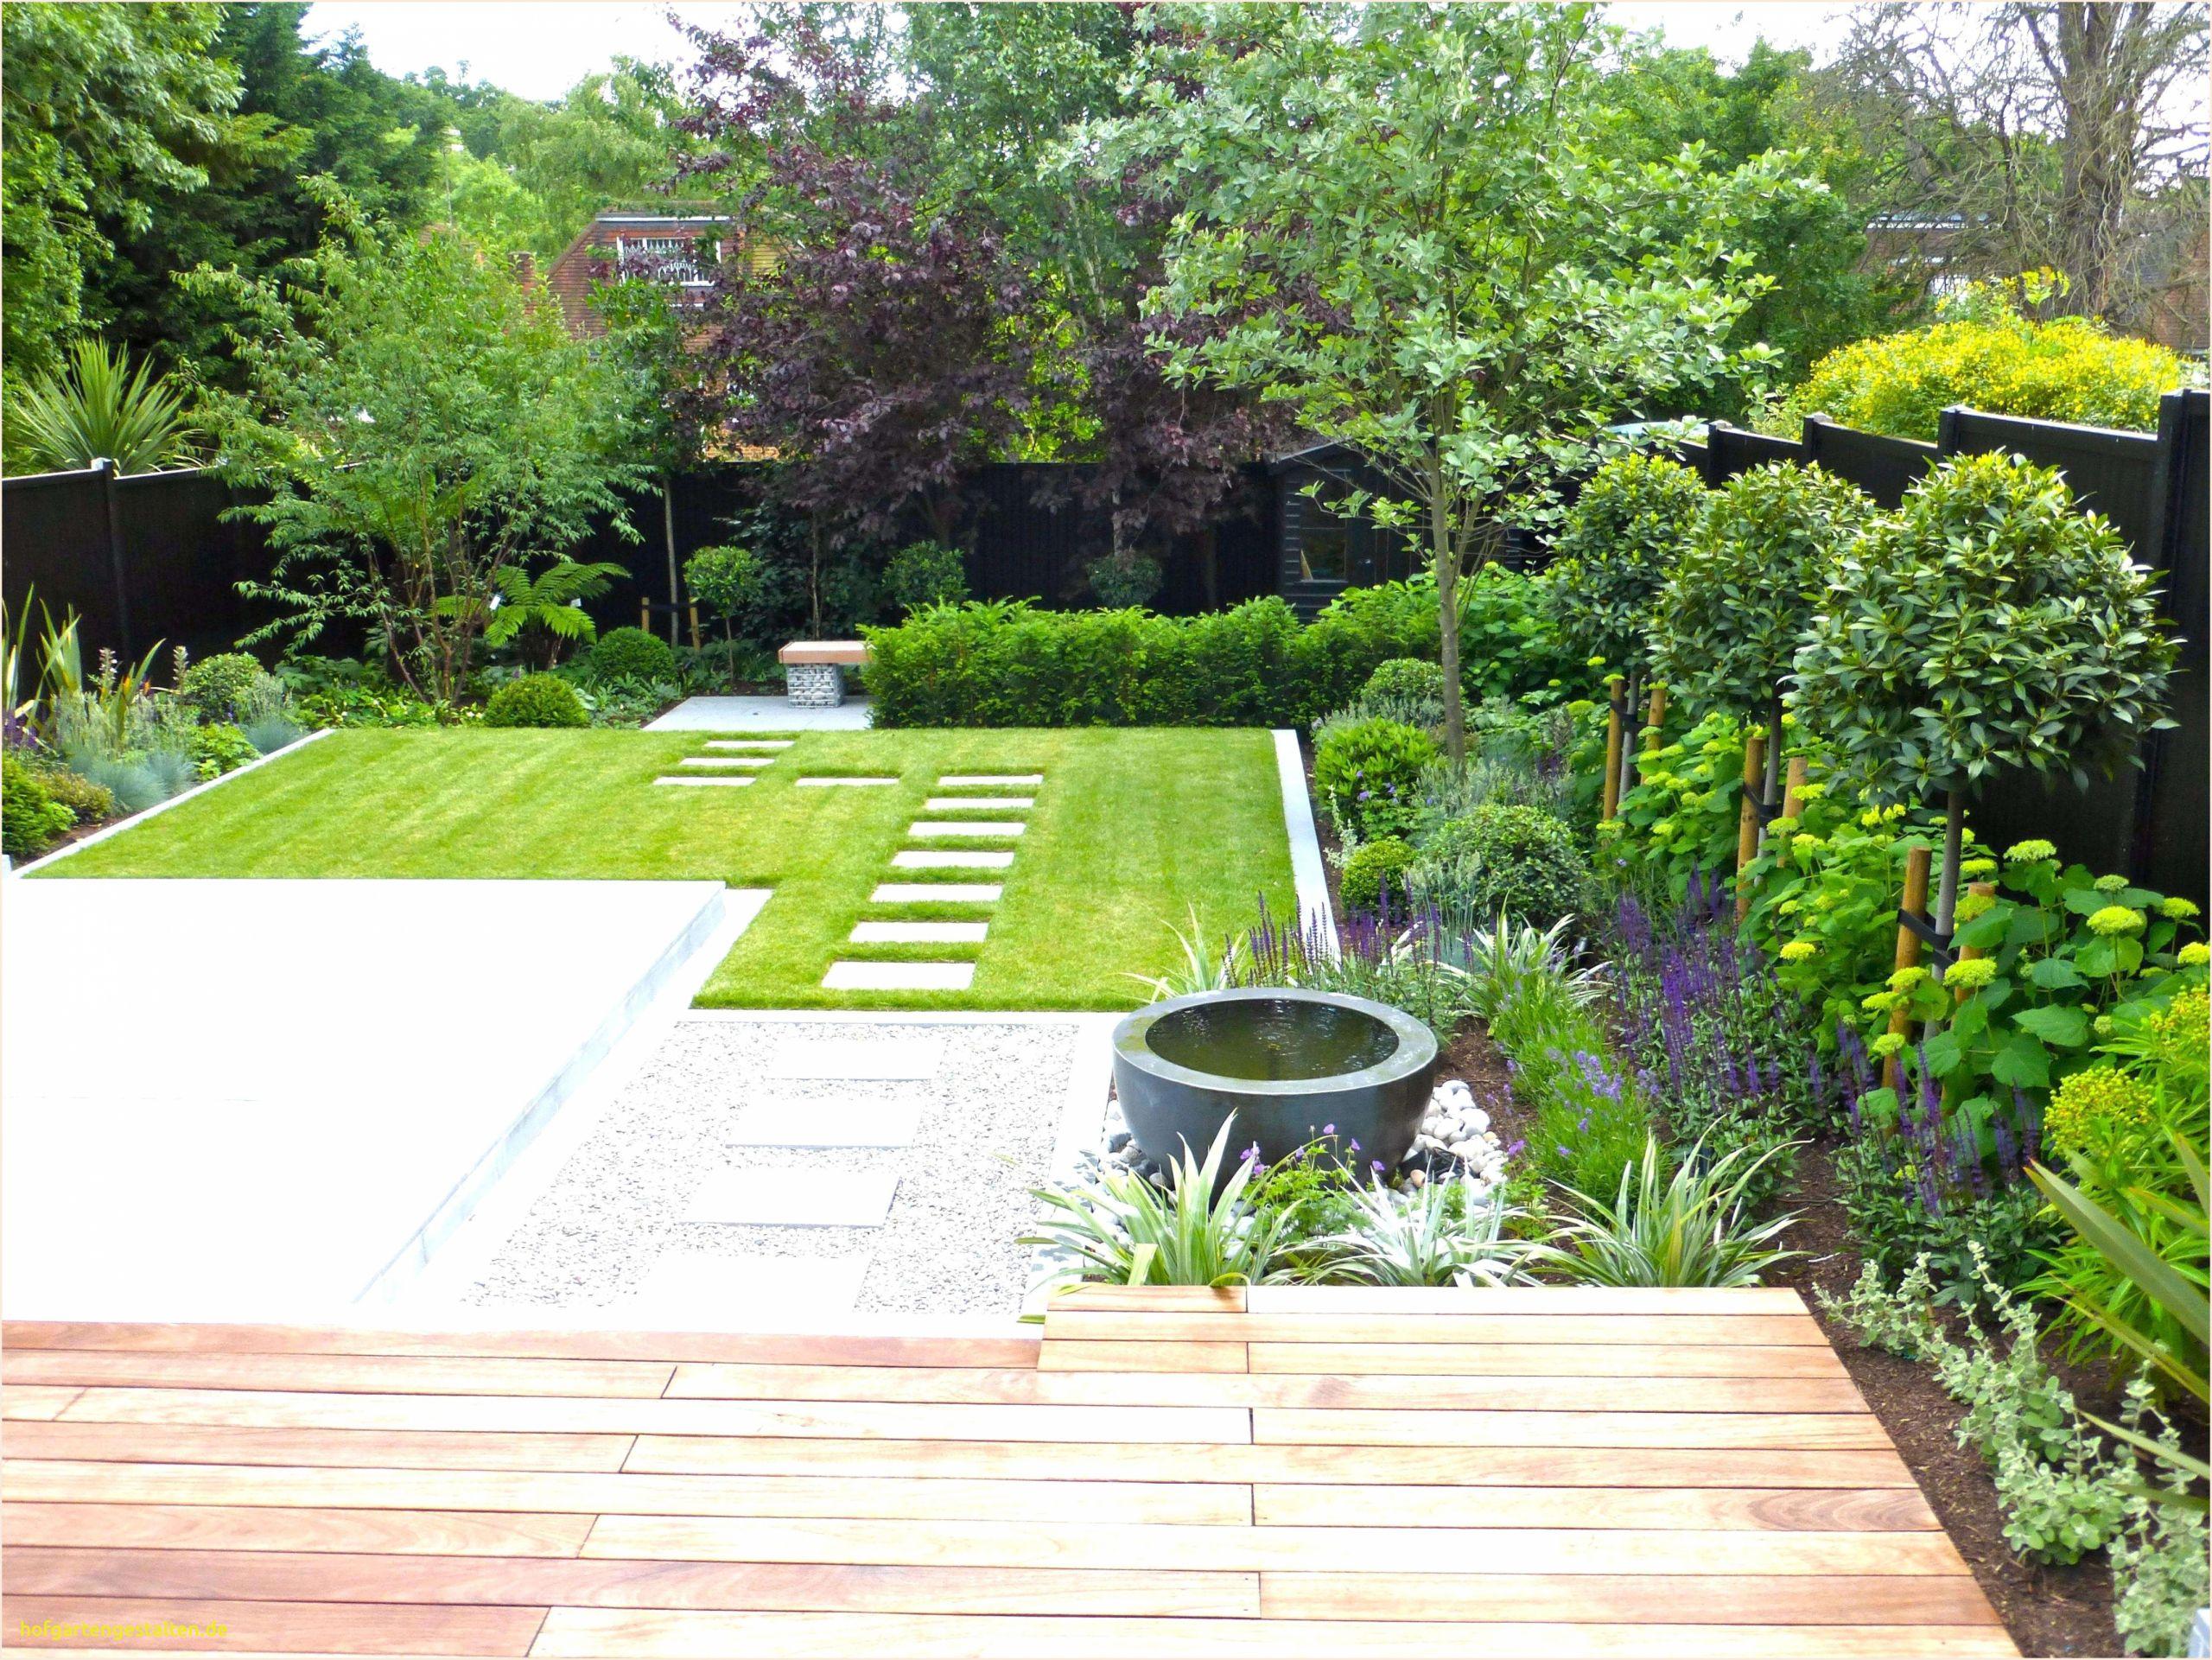 Deko Ideen Selber Machen Garten Einzigartig Deko Garten Selber Machen — Temobardz Home Blog